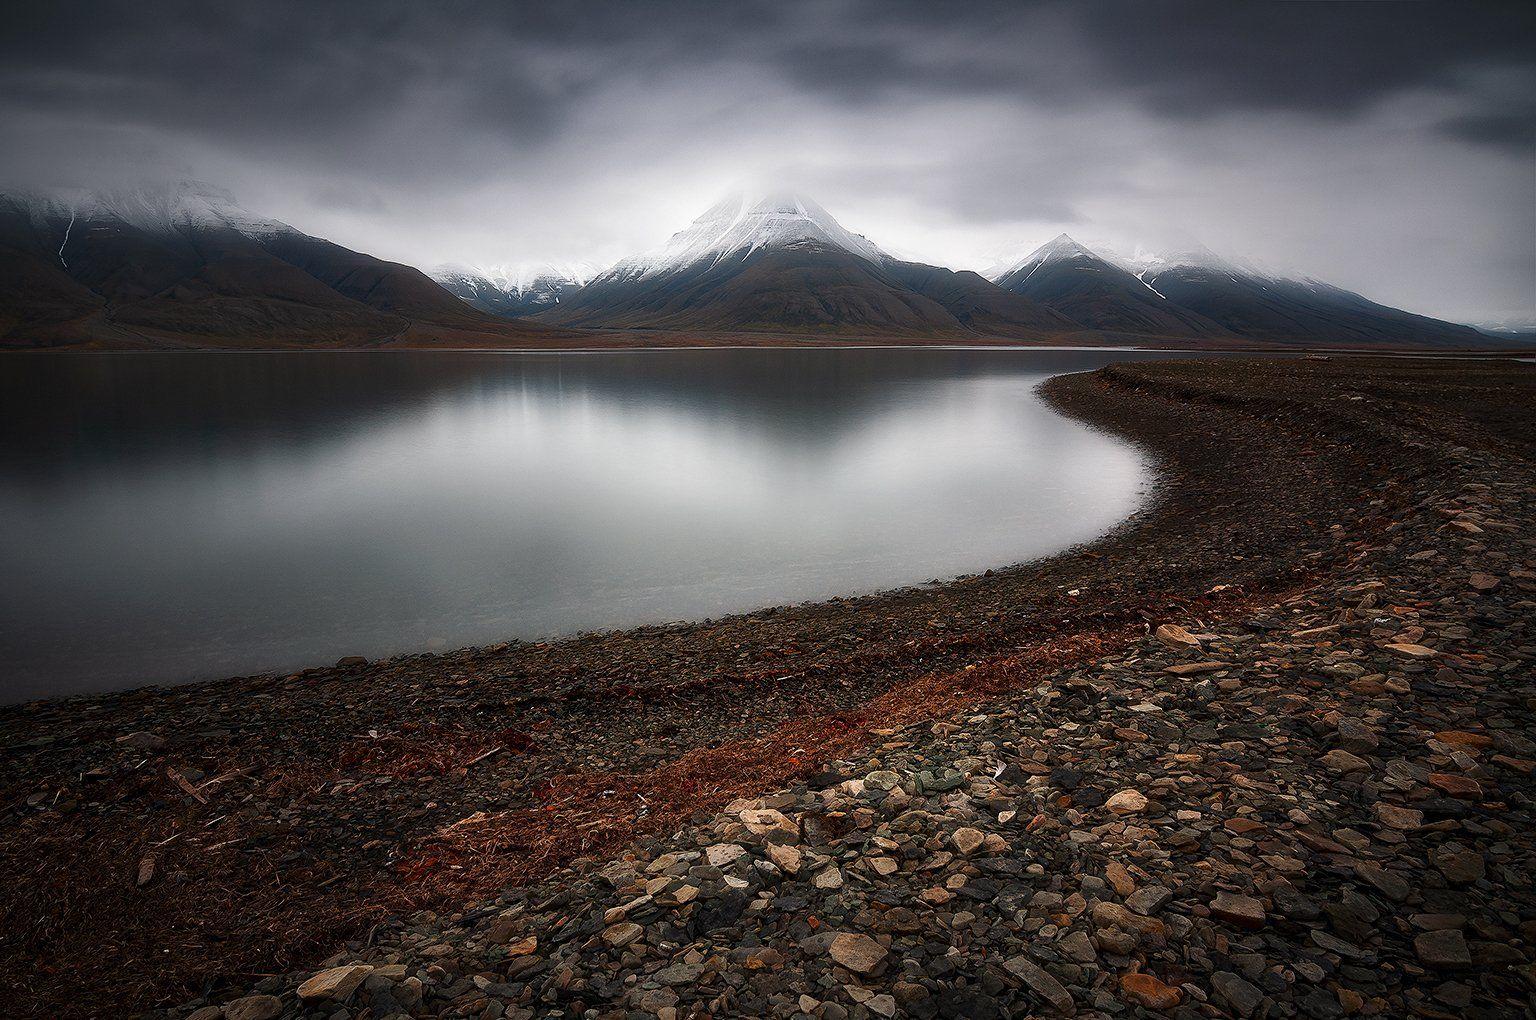 svalbard, spitsbergen, northnorway, islands, sandstones, polar, arctic, summer, longexposure, Csomai David